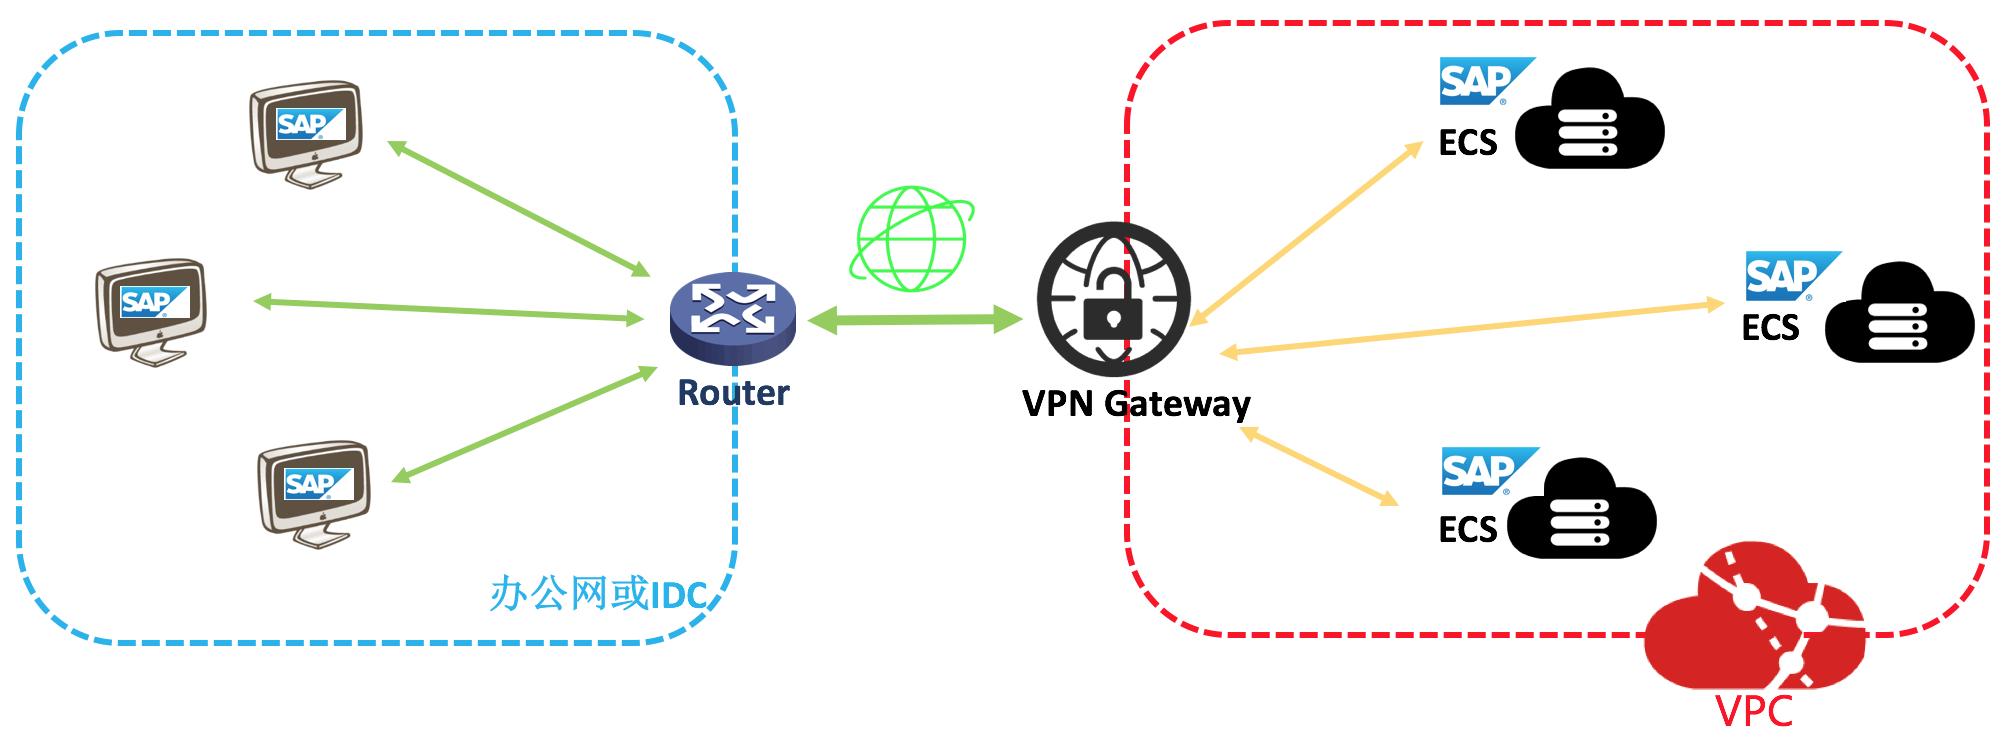 sap-netweaver-planning-vpn